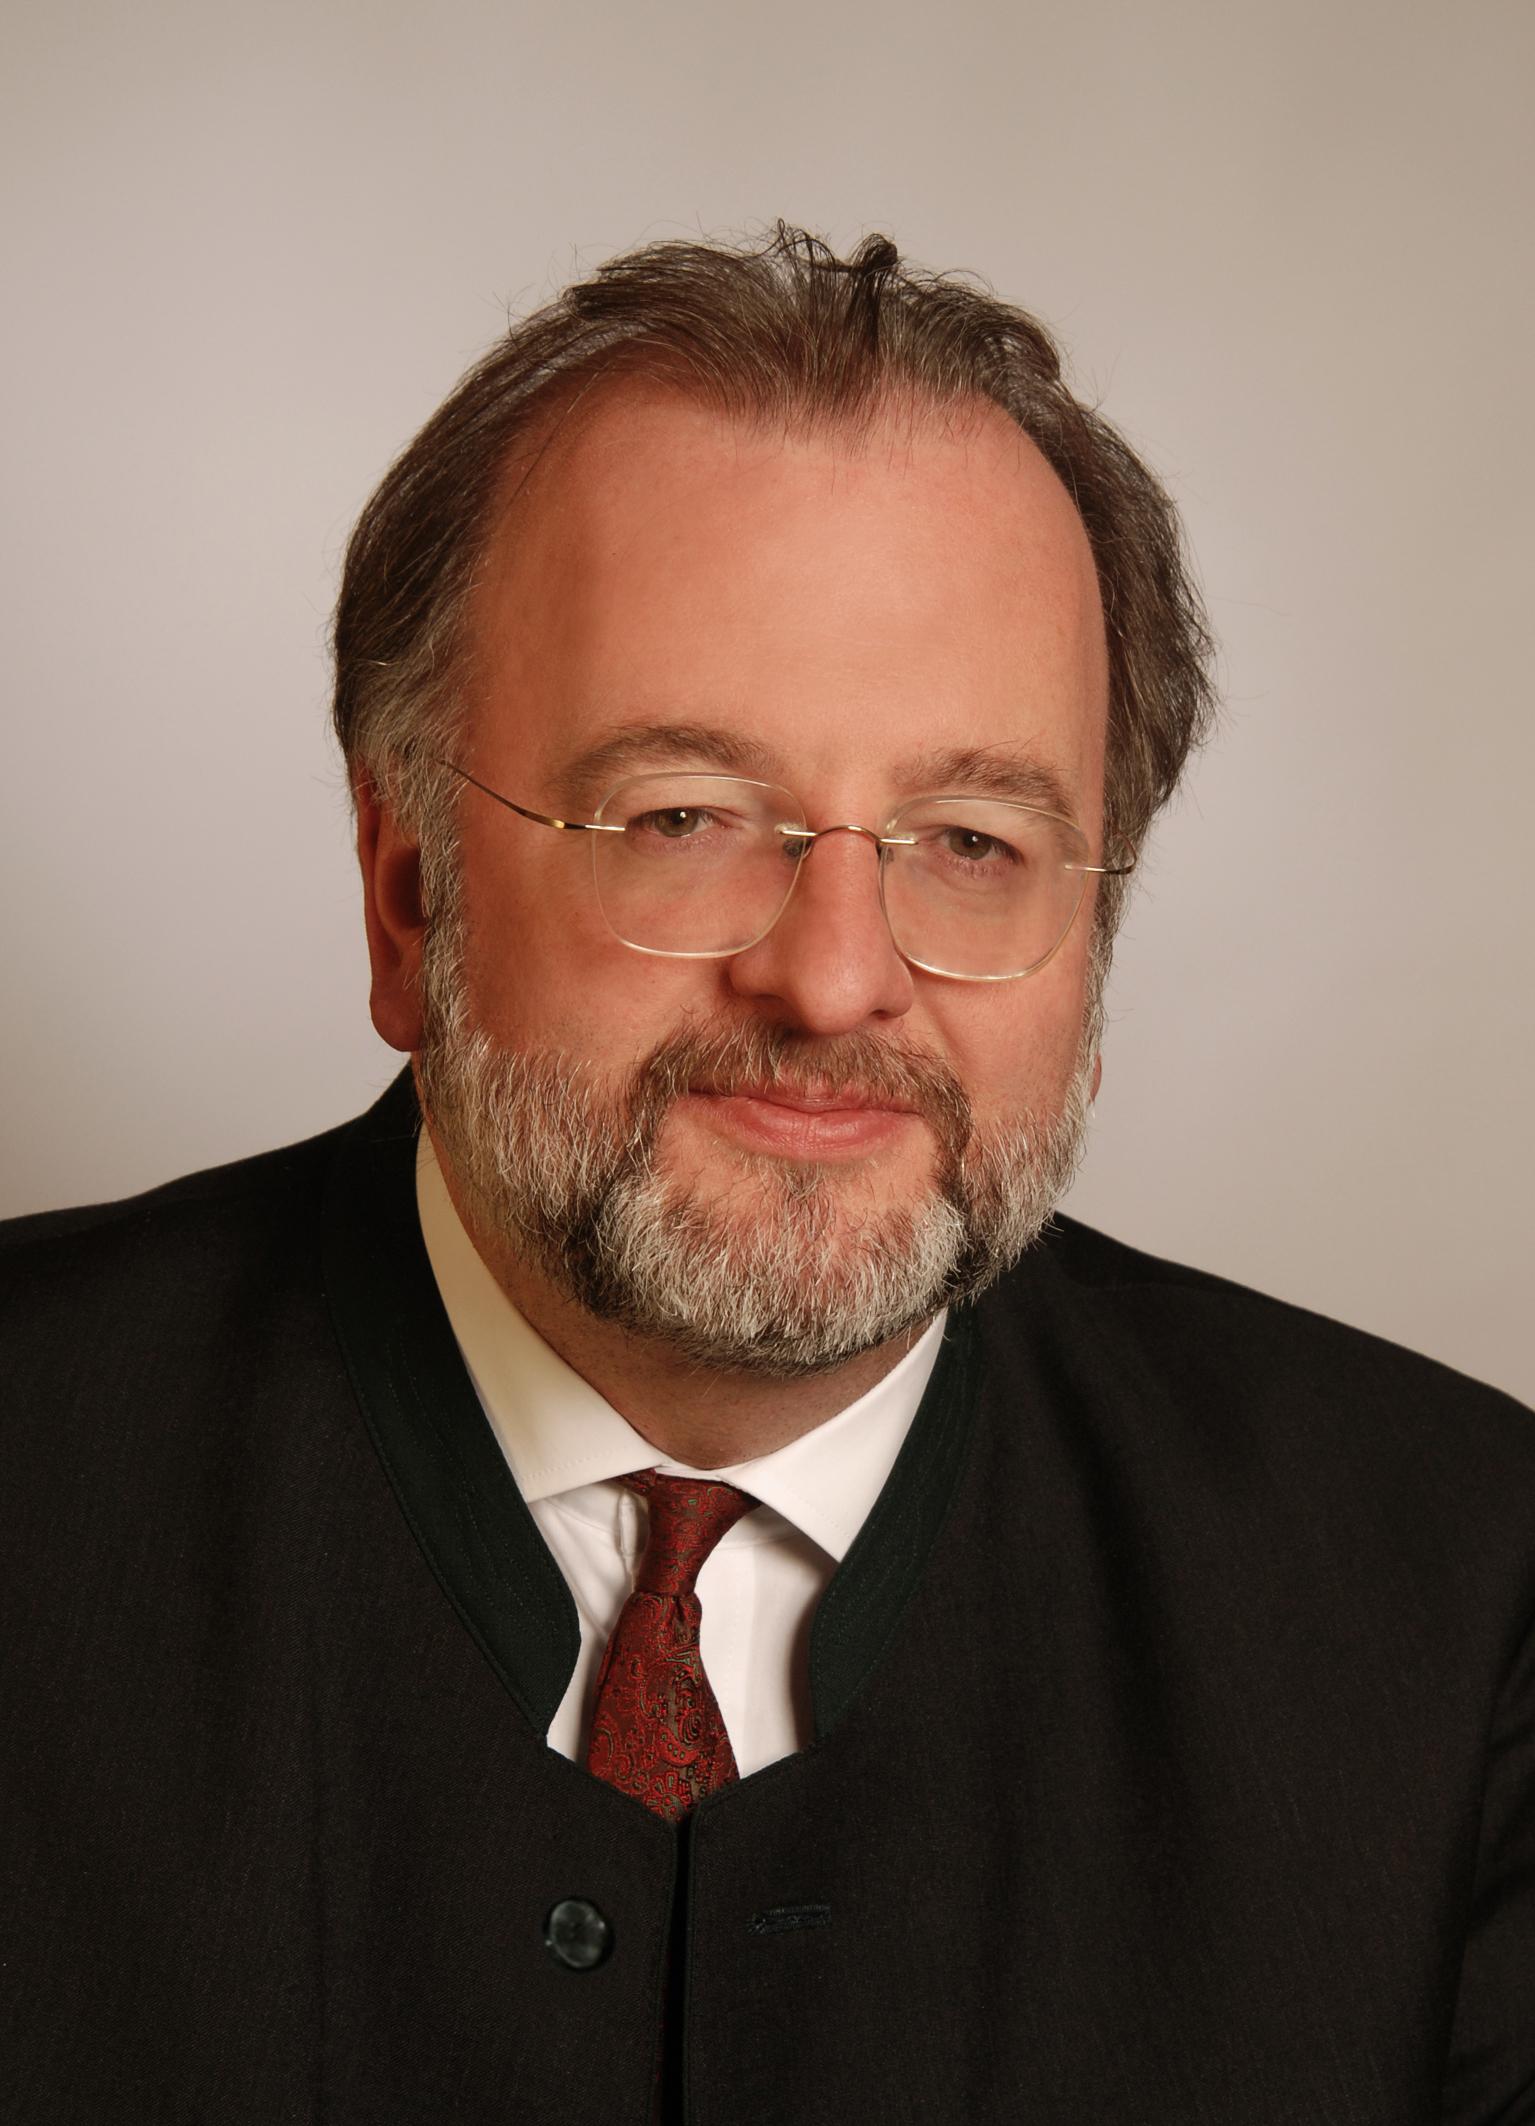 Leopold-Michael Marzi